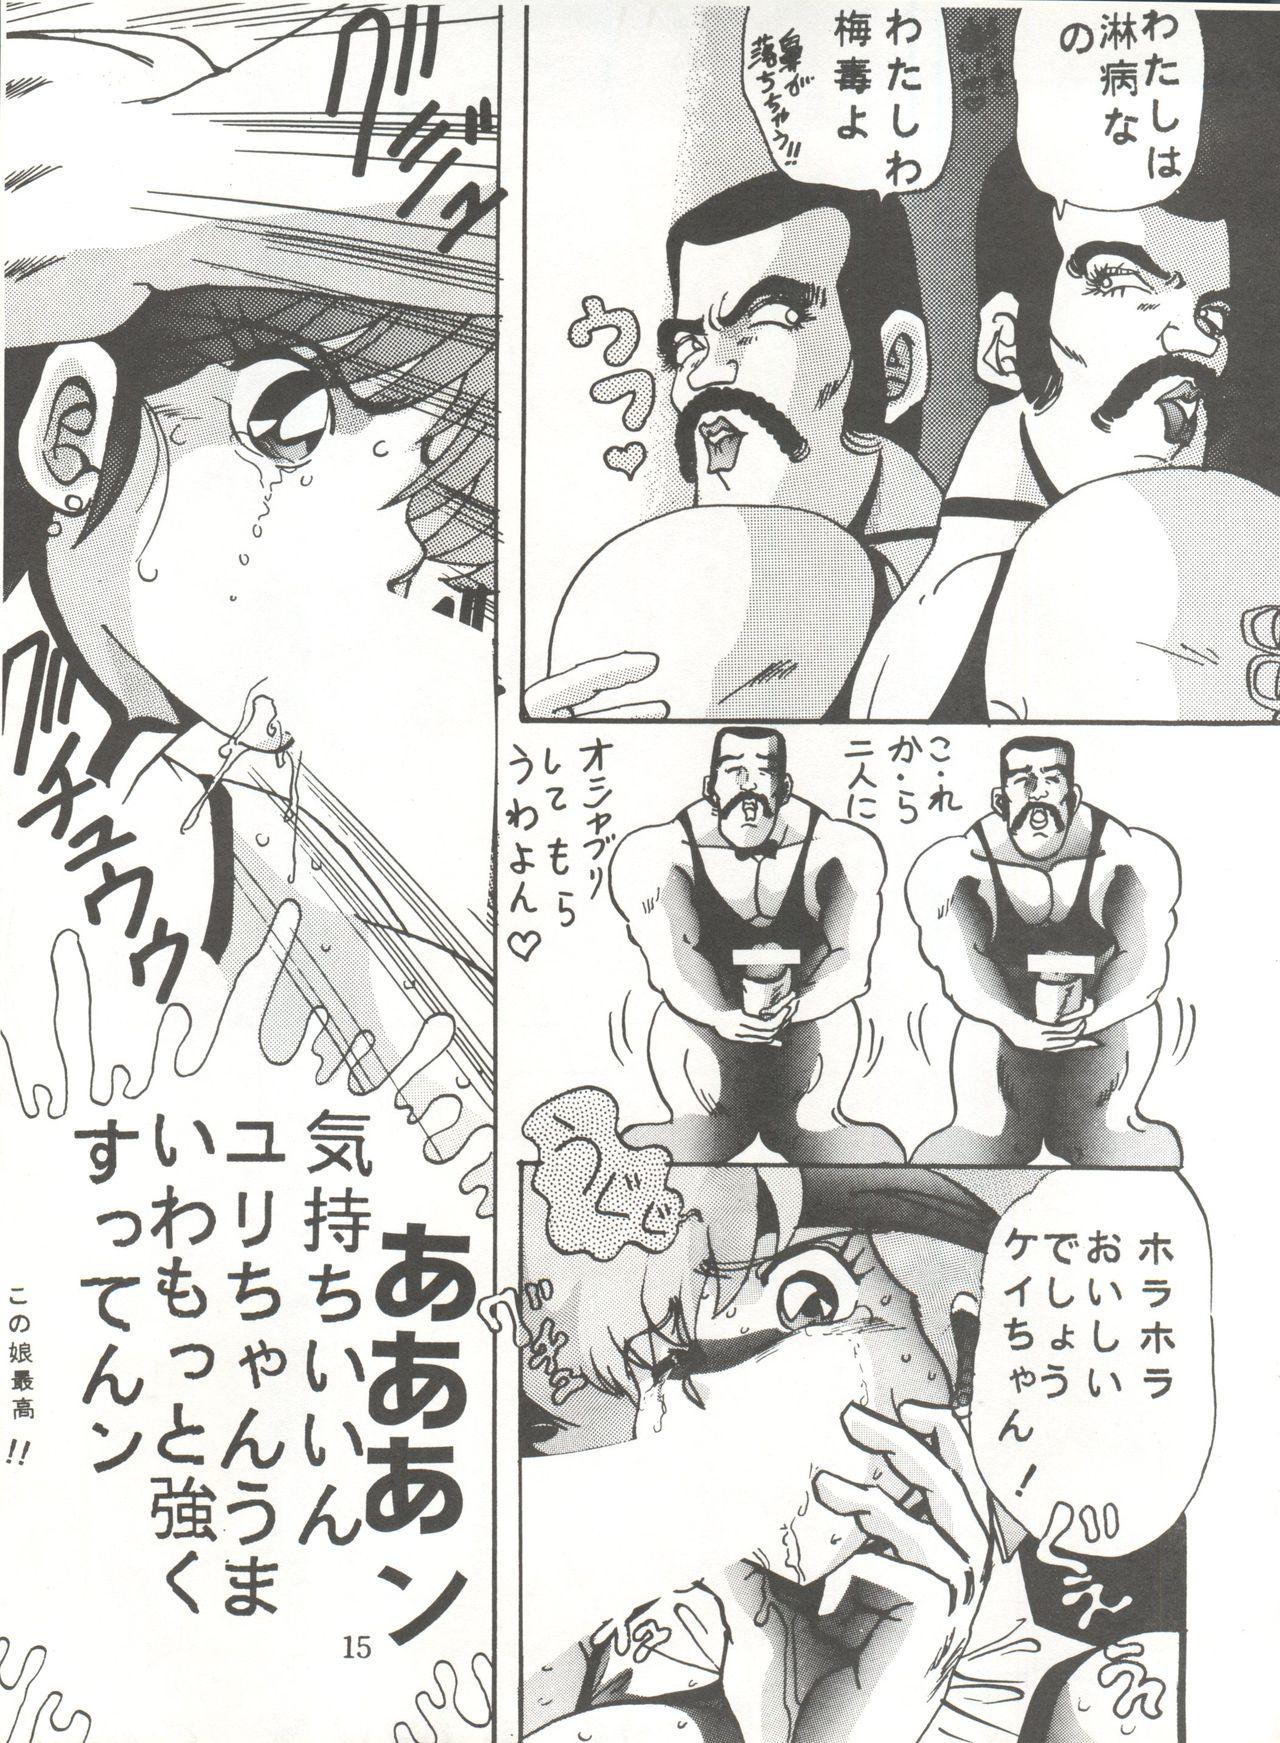 [Global One (MARO)] Sadistic 5 (Cutey Honey, Devilman, Sailor Moon), [Global One (MARO)] Sadistic (Dirty Pair, Fushigi no Umi no Nadia, Sailor Moon), [Studio Ikkatsumajin] .ribbon (Hime-chan's Ribbon) 74